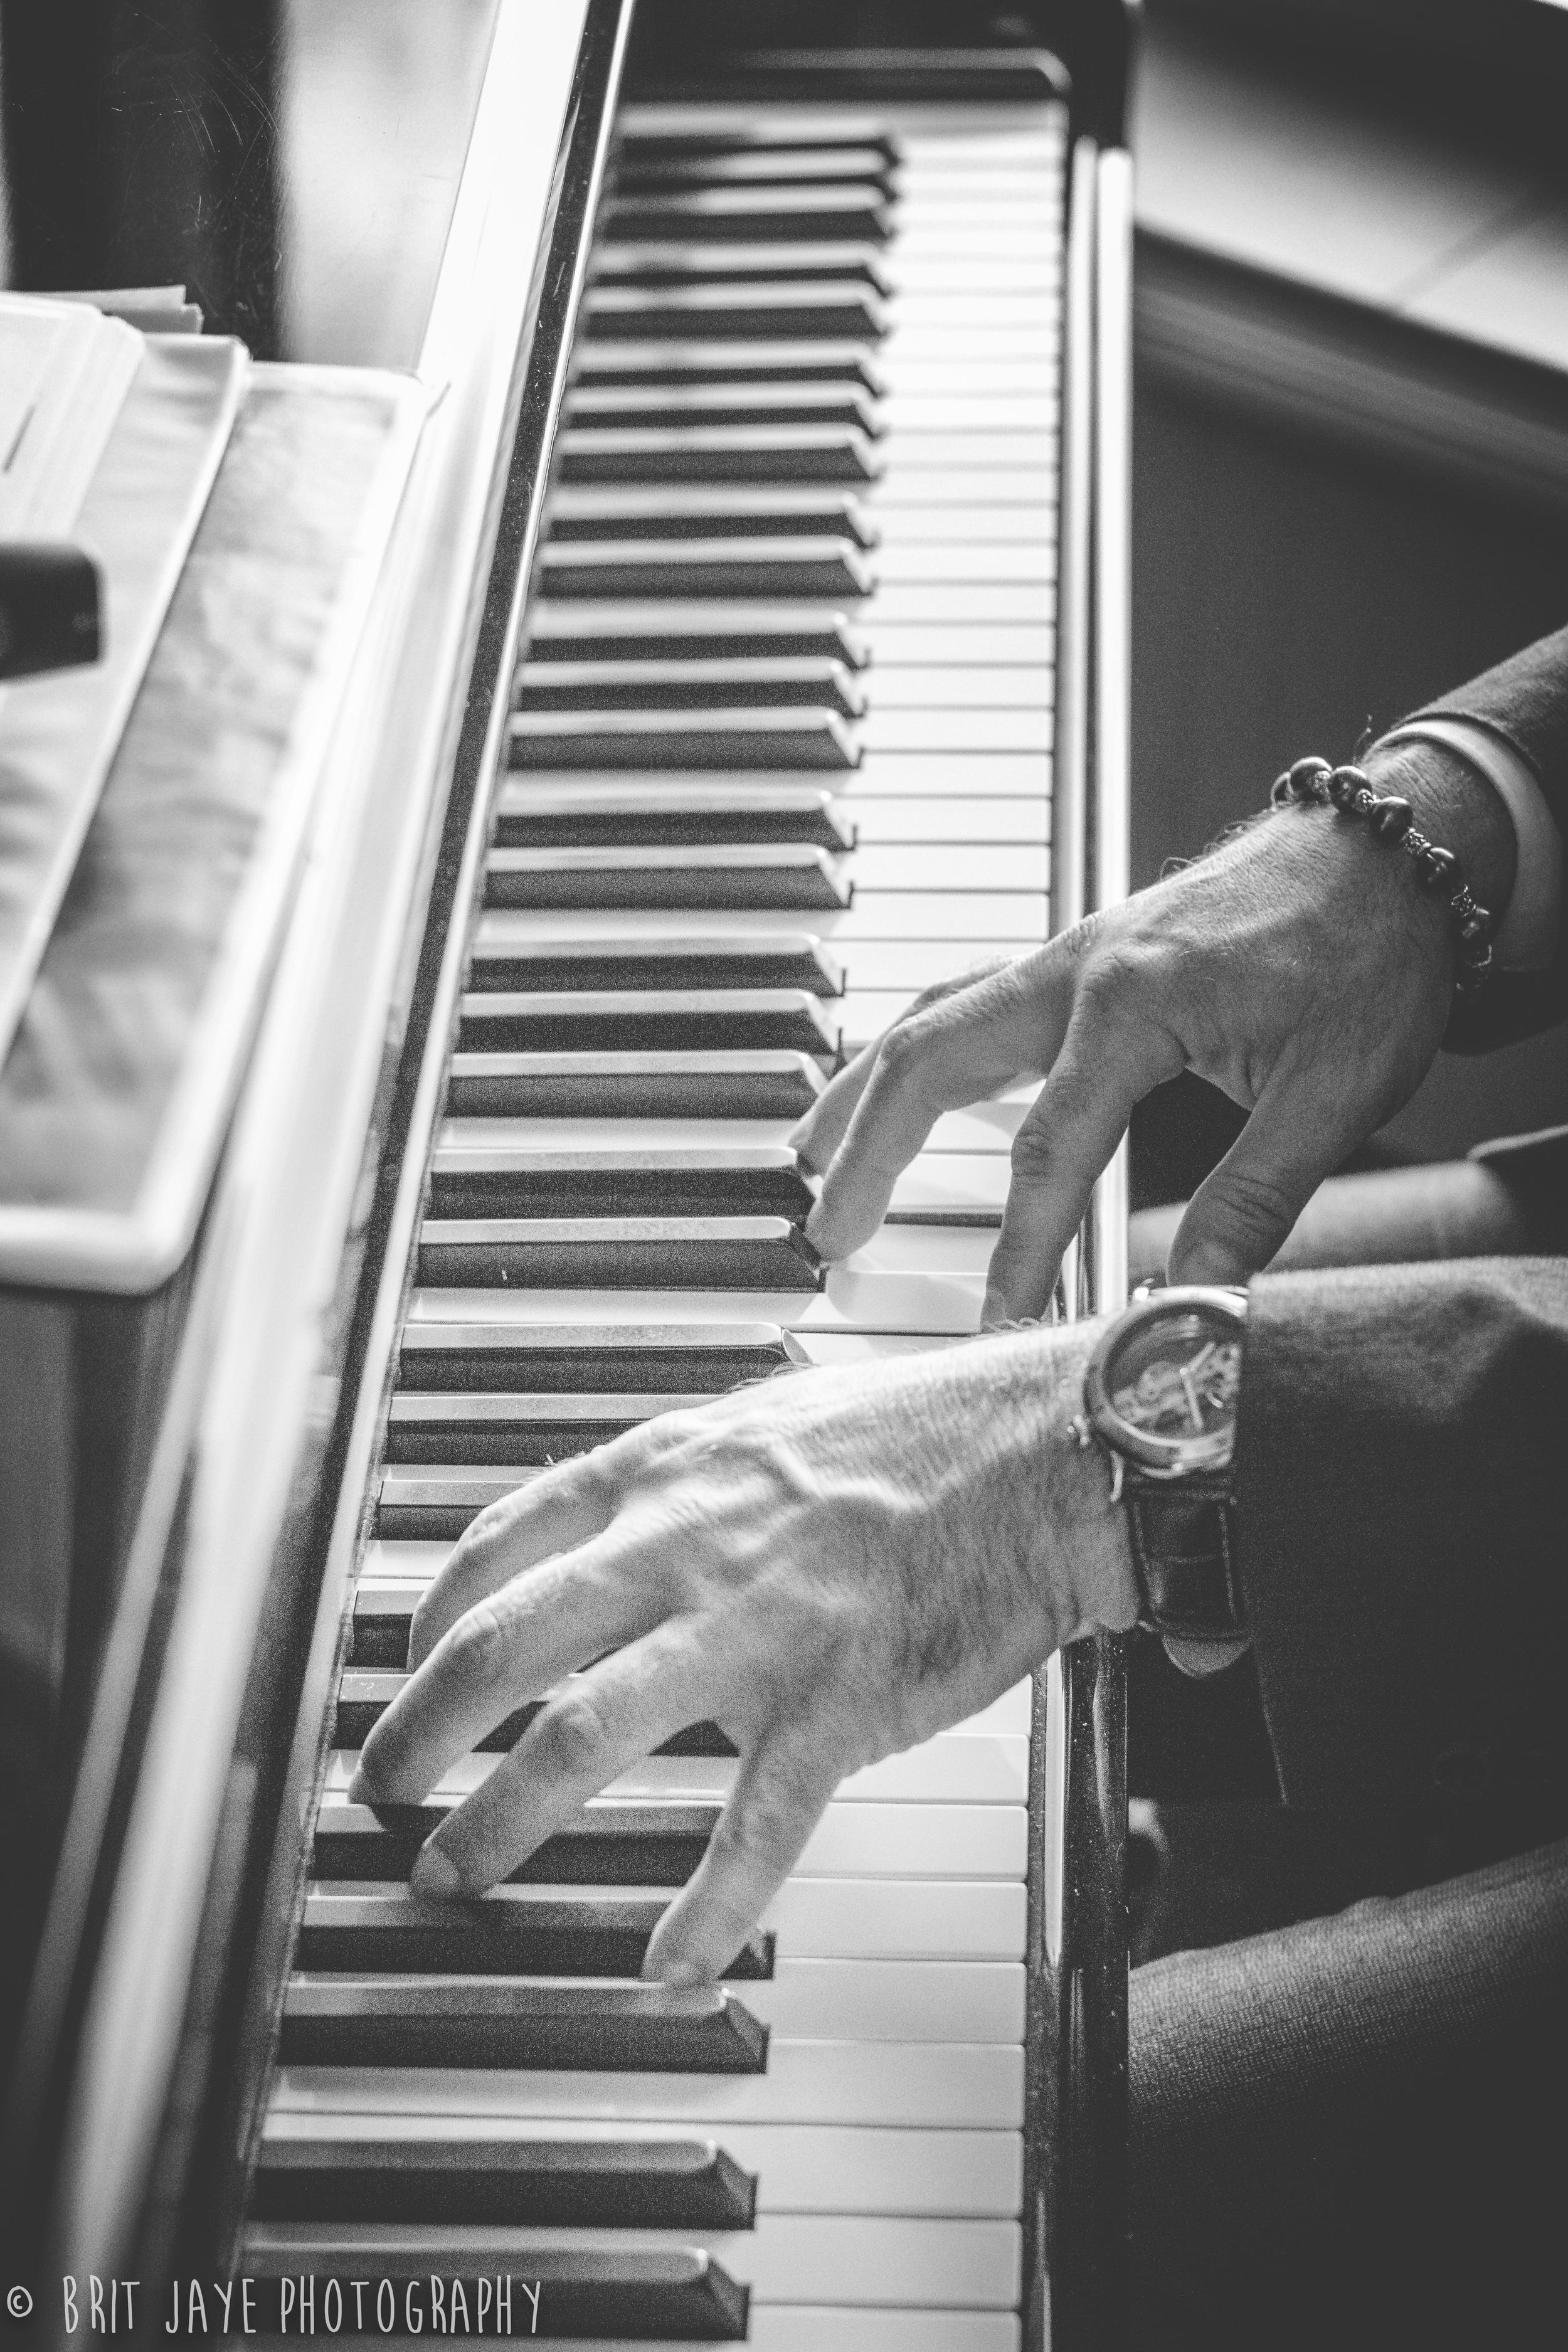 PianoPlayerLiveMusicWeddingReception